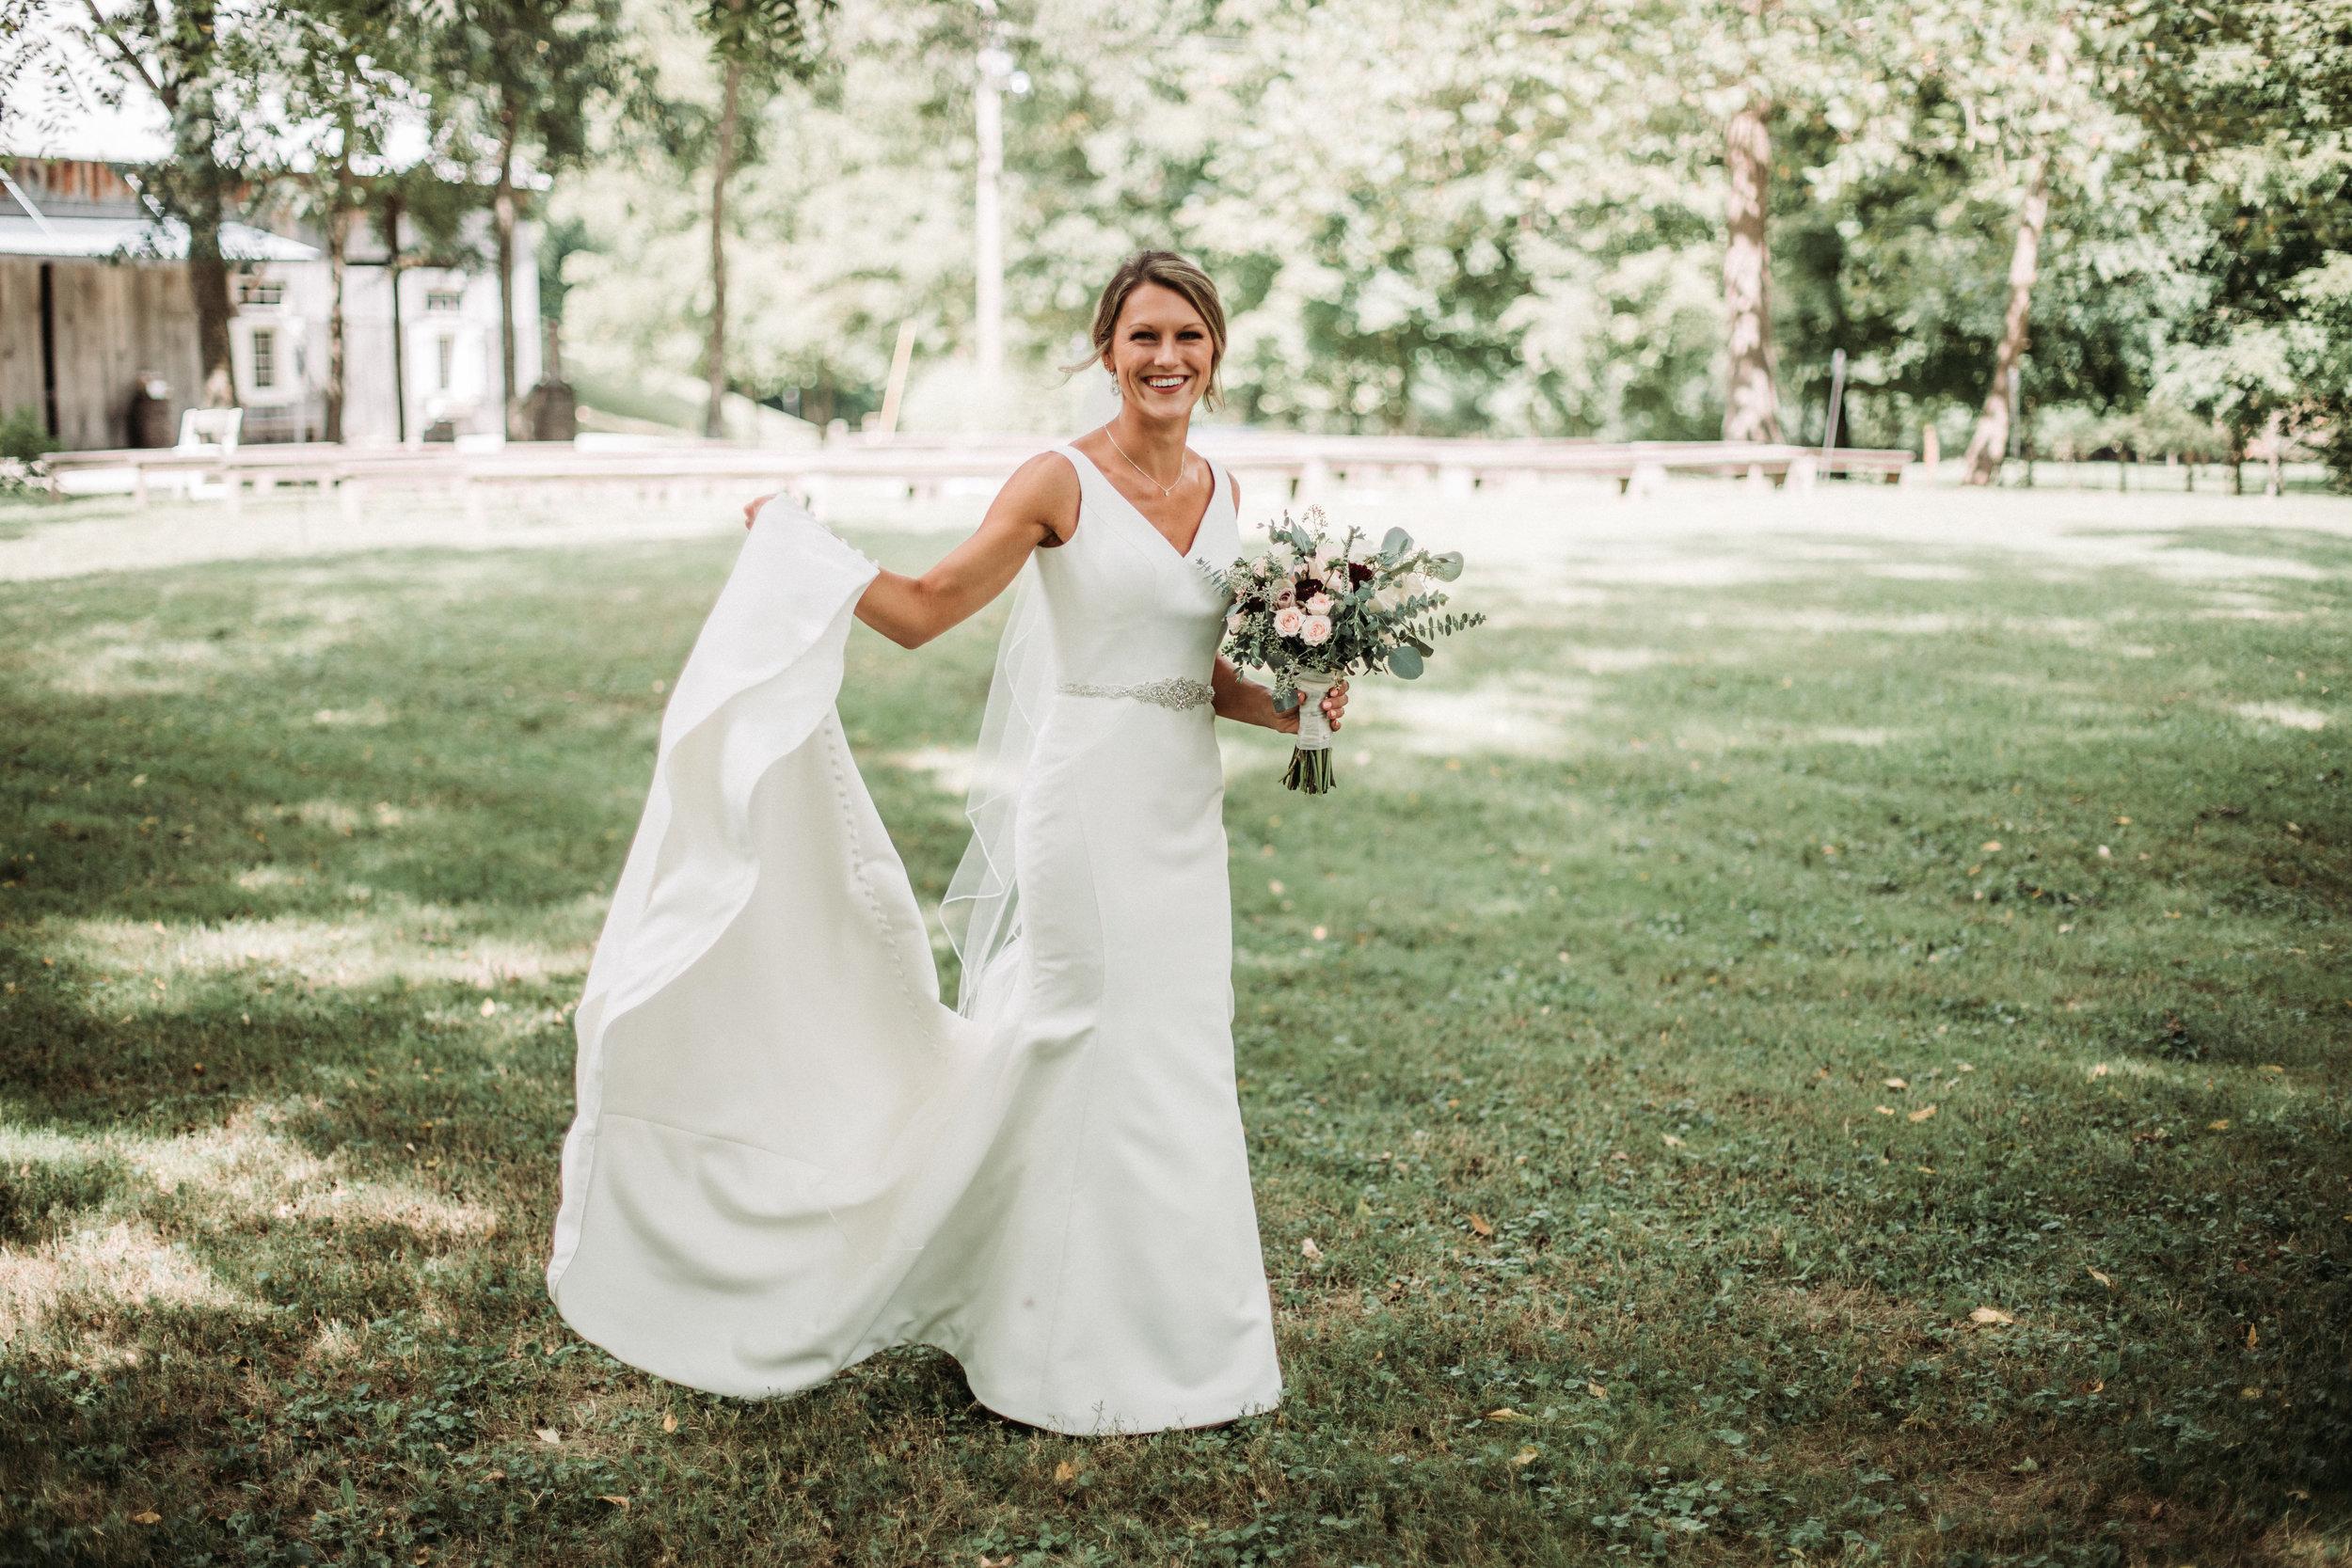 brown_county_fall_summer_wedding-36.jpg